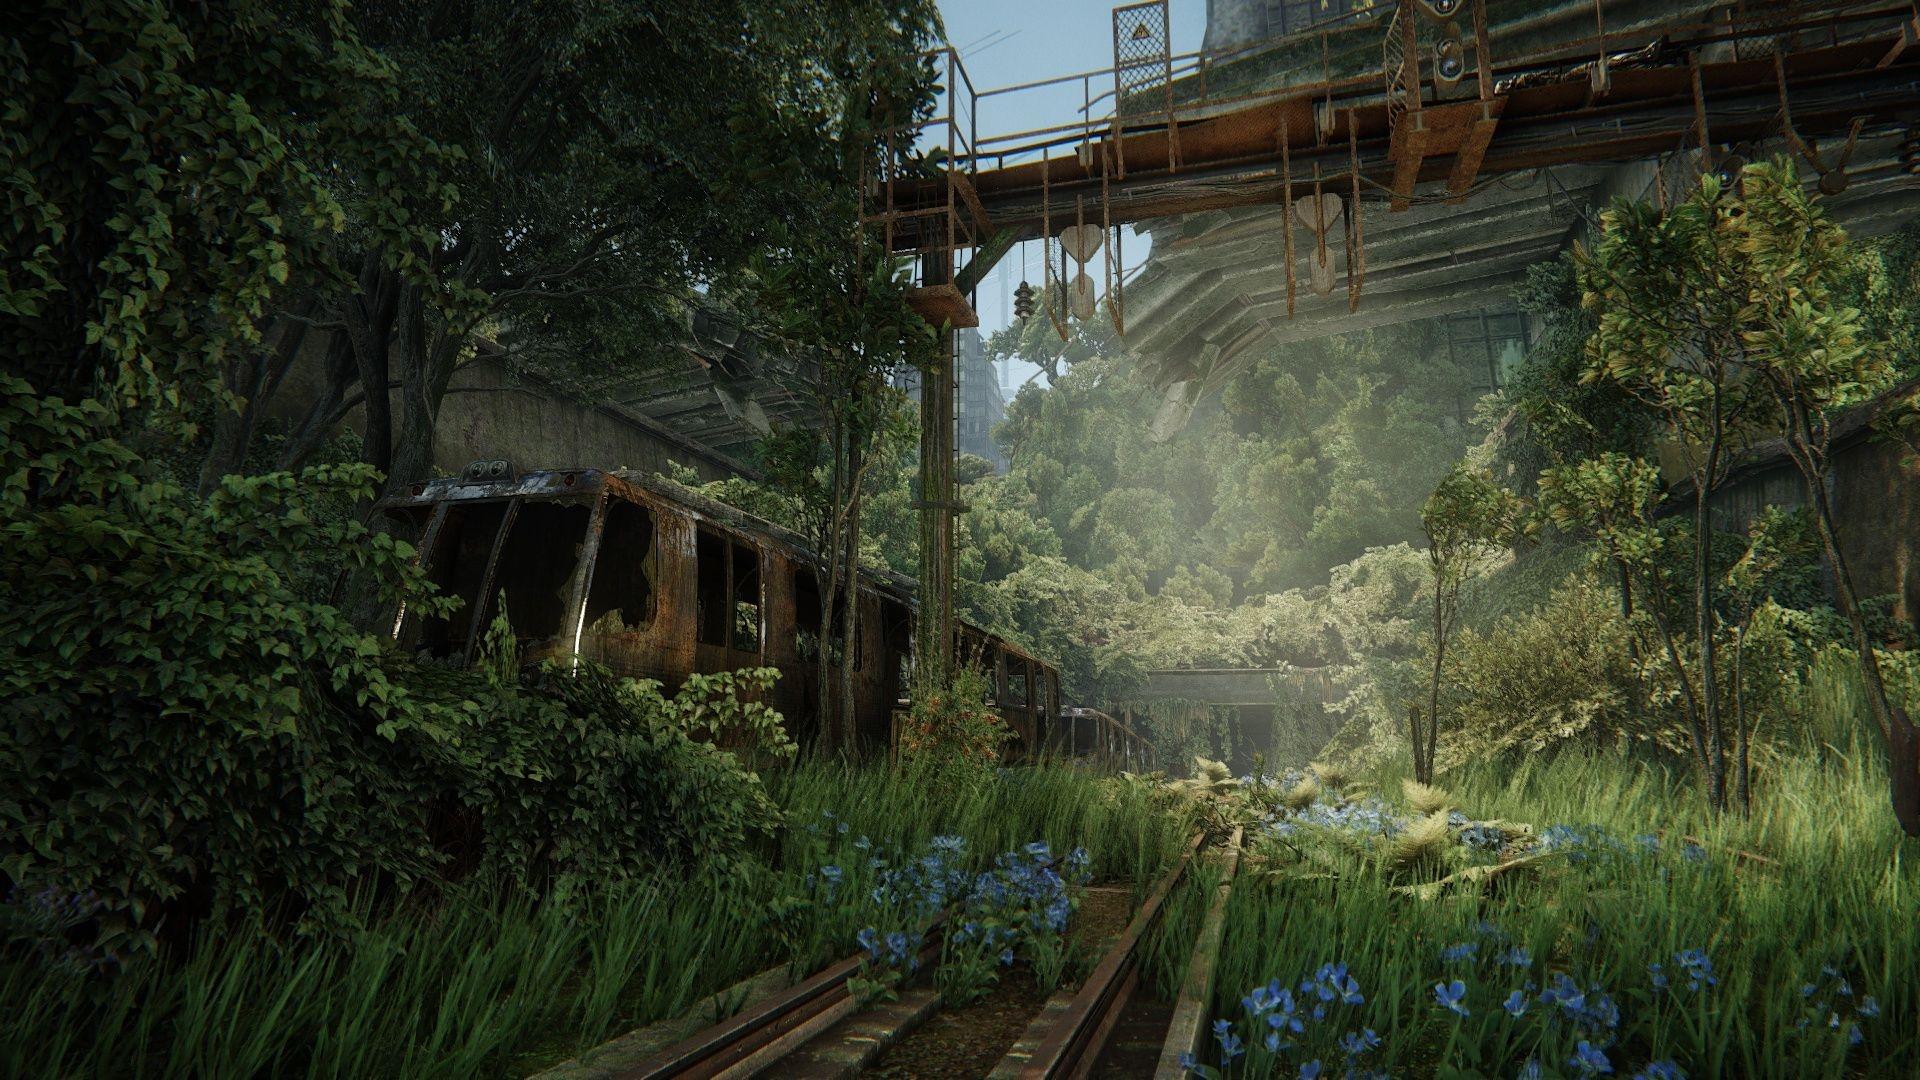 Post Apocalyptic Overgrown City free image